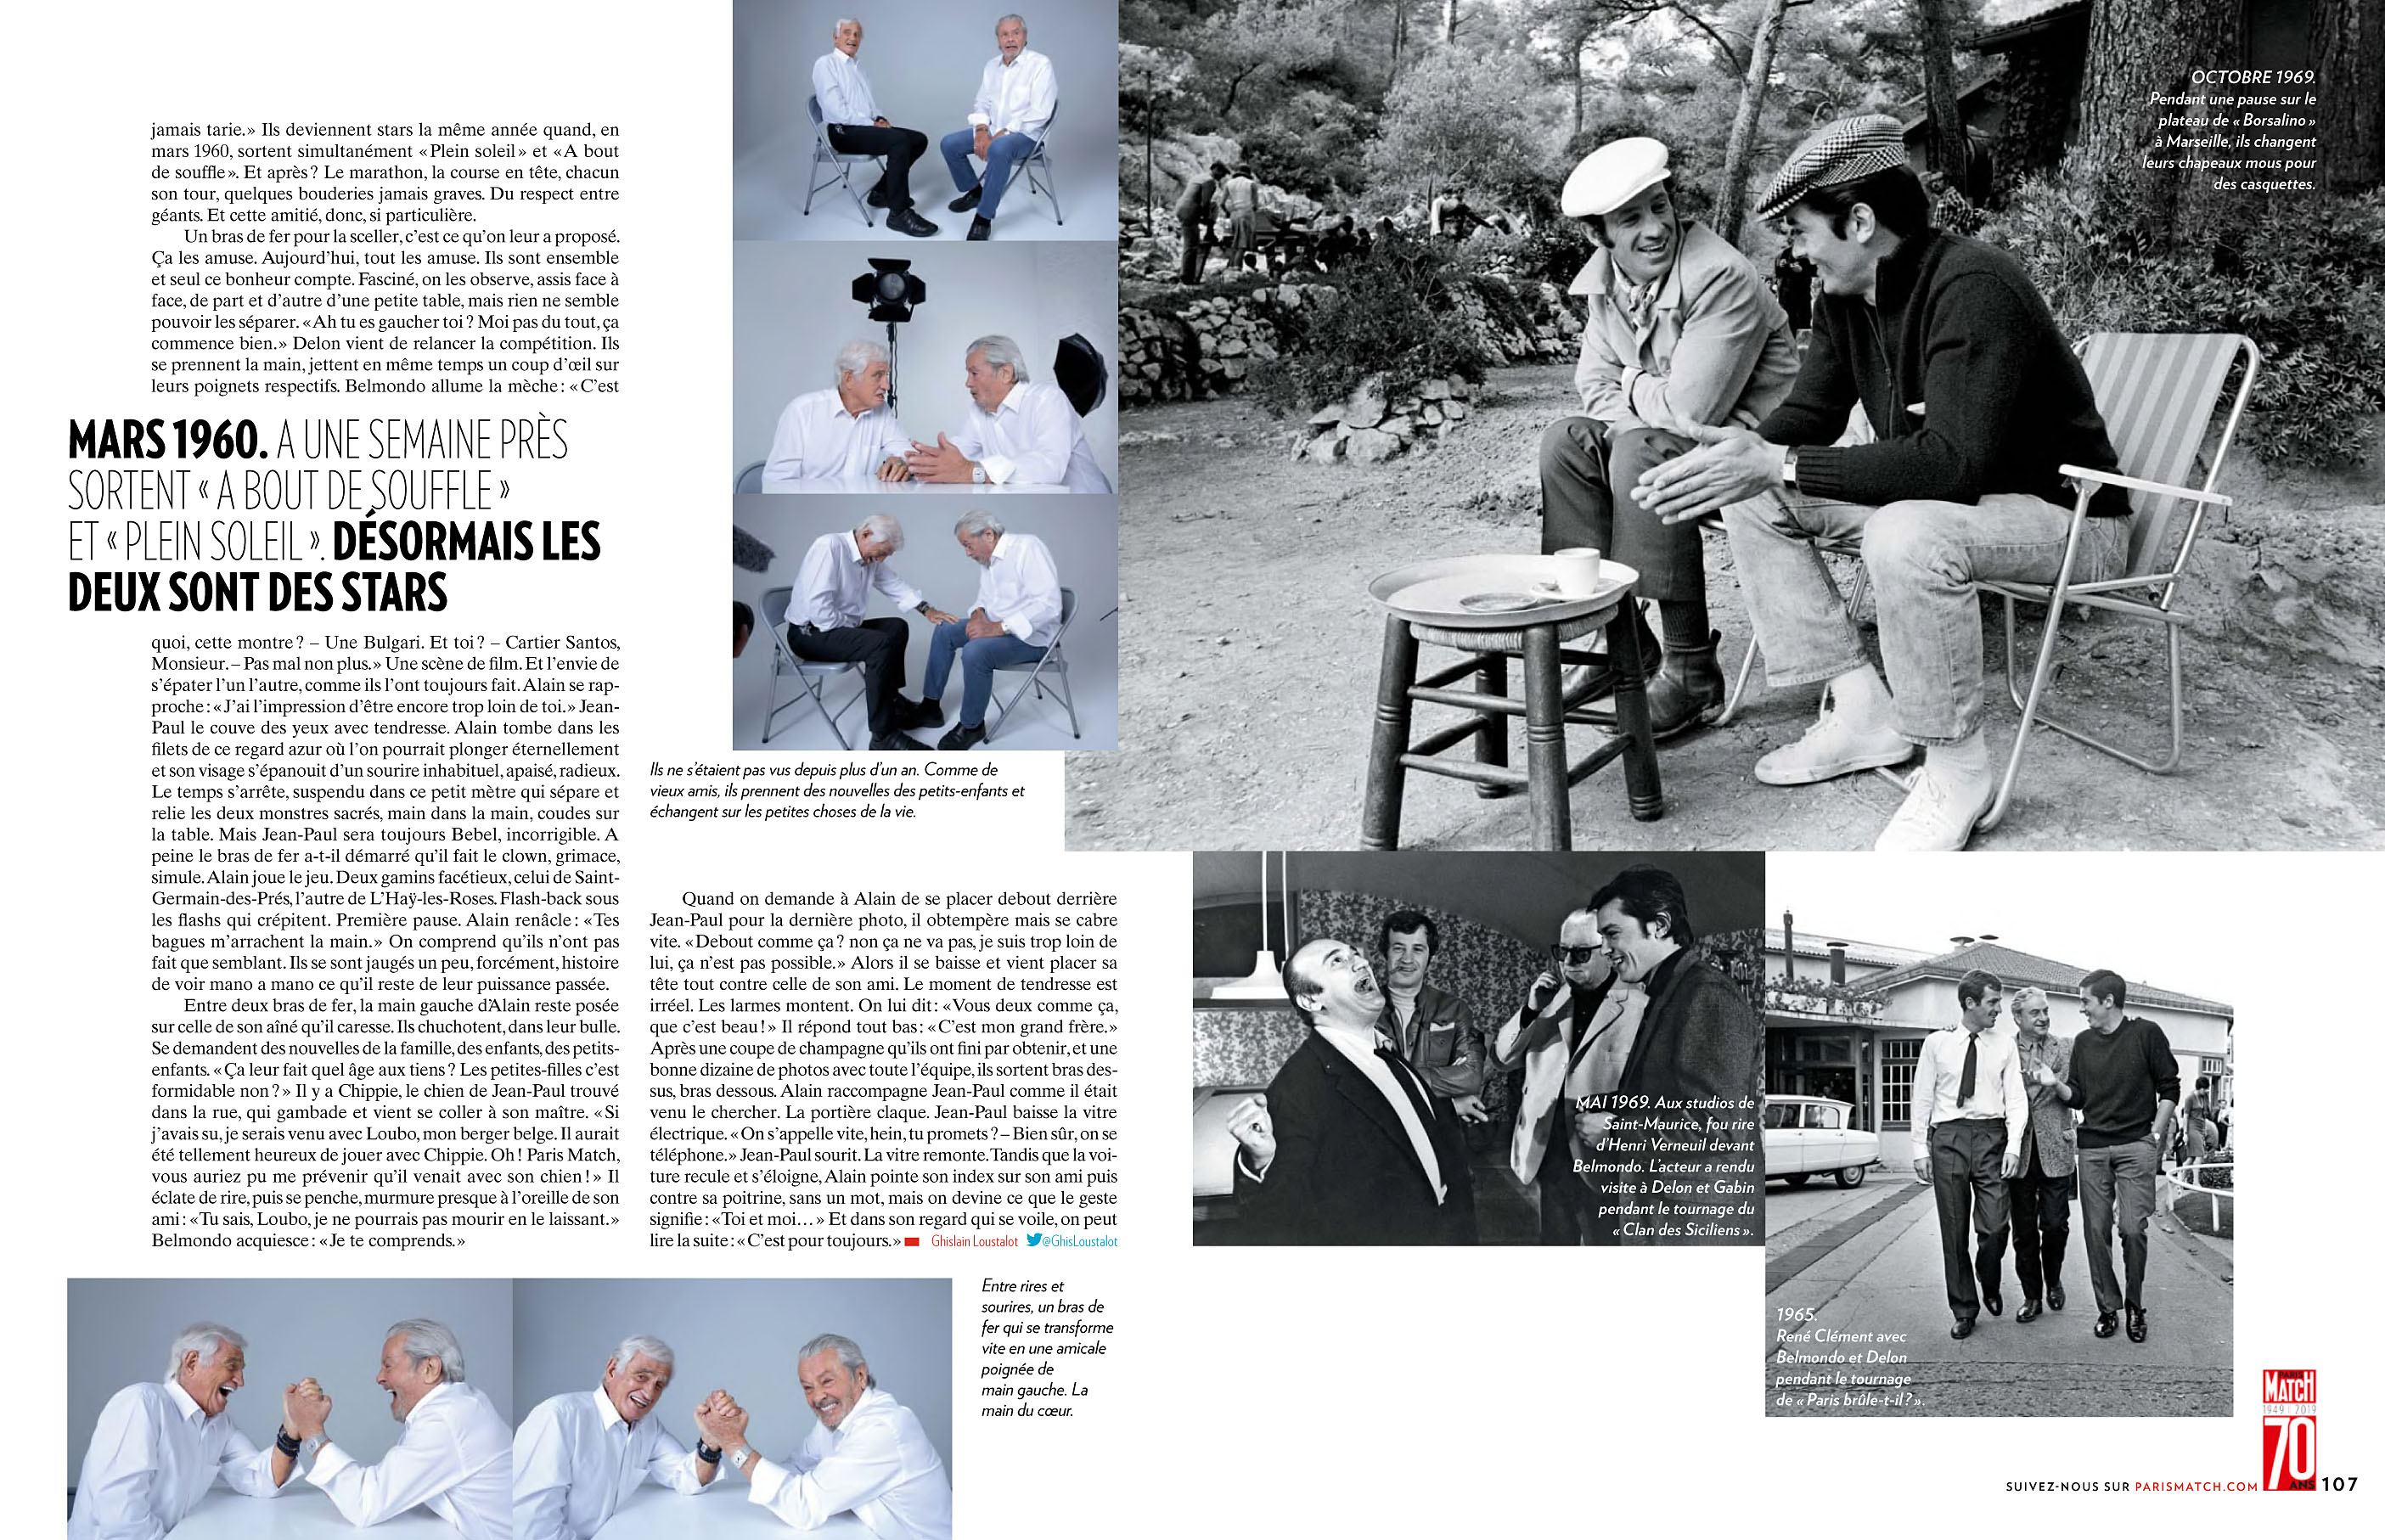 Paris Match 3657 190612 Delon 04.jpg